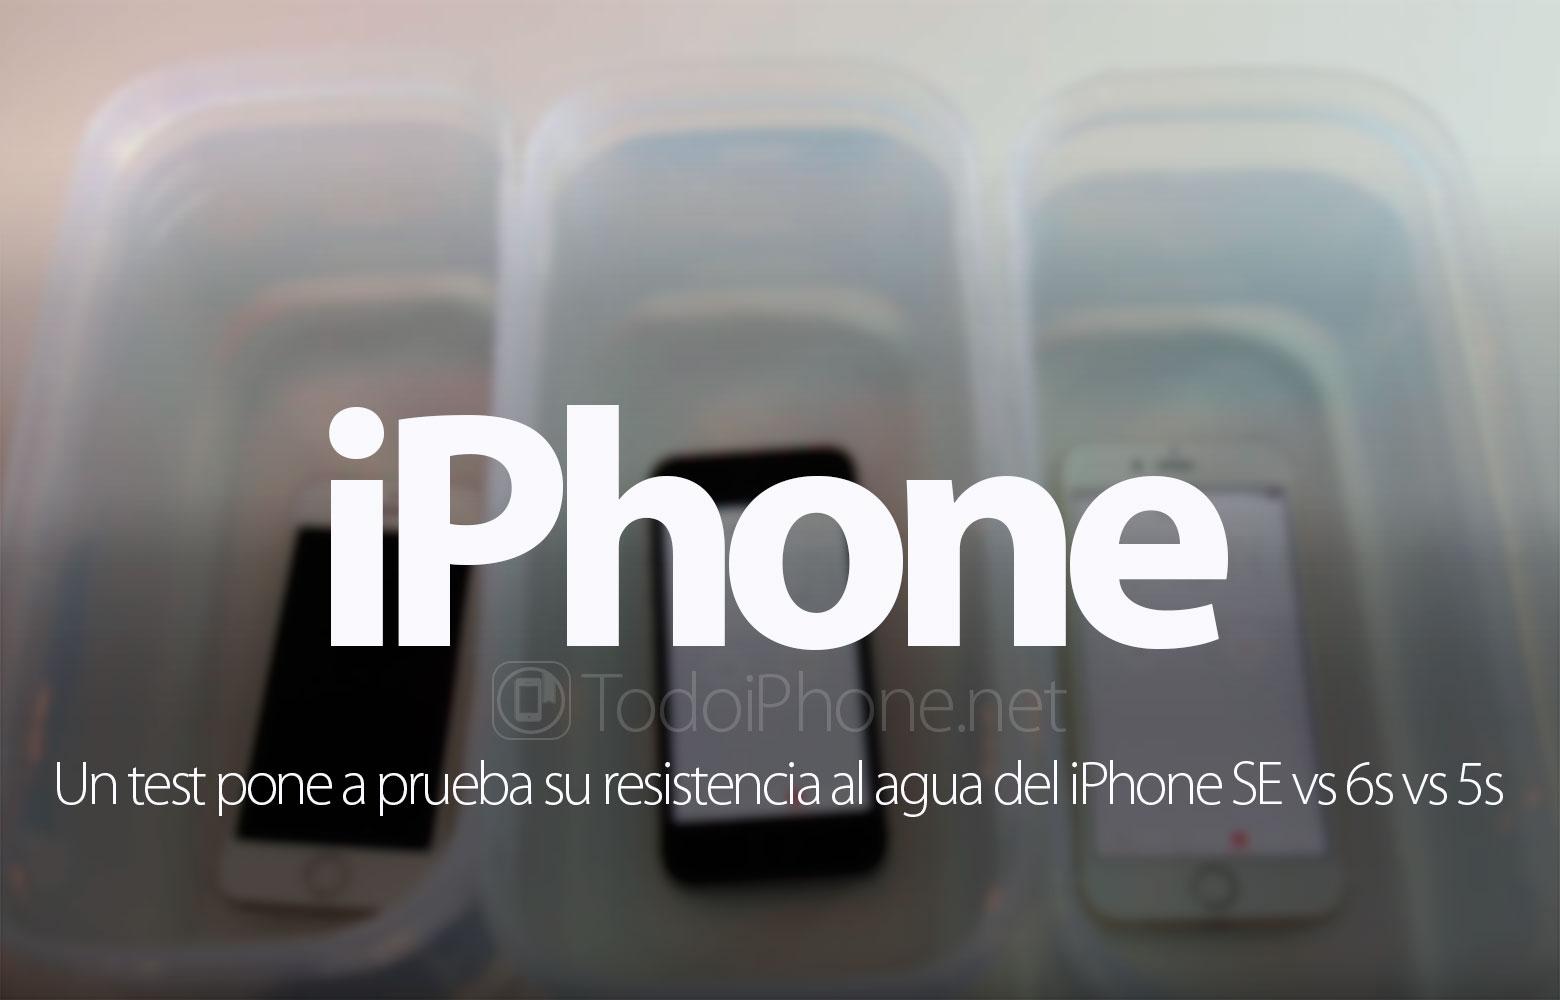 iphone-se-vs-iphone-6s-vs-iphone-5s-prueba-resistencia-agua